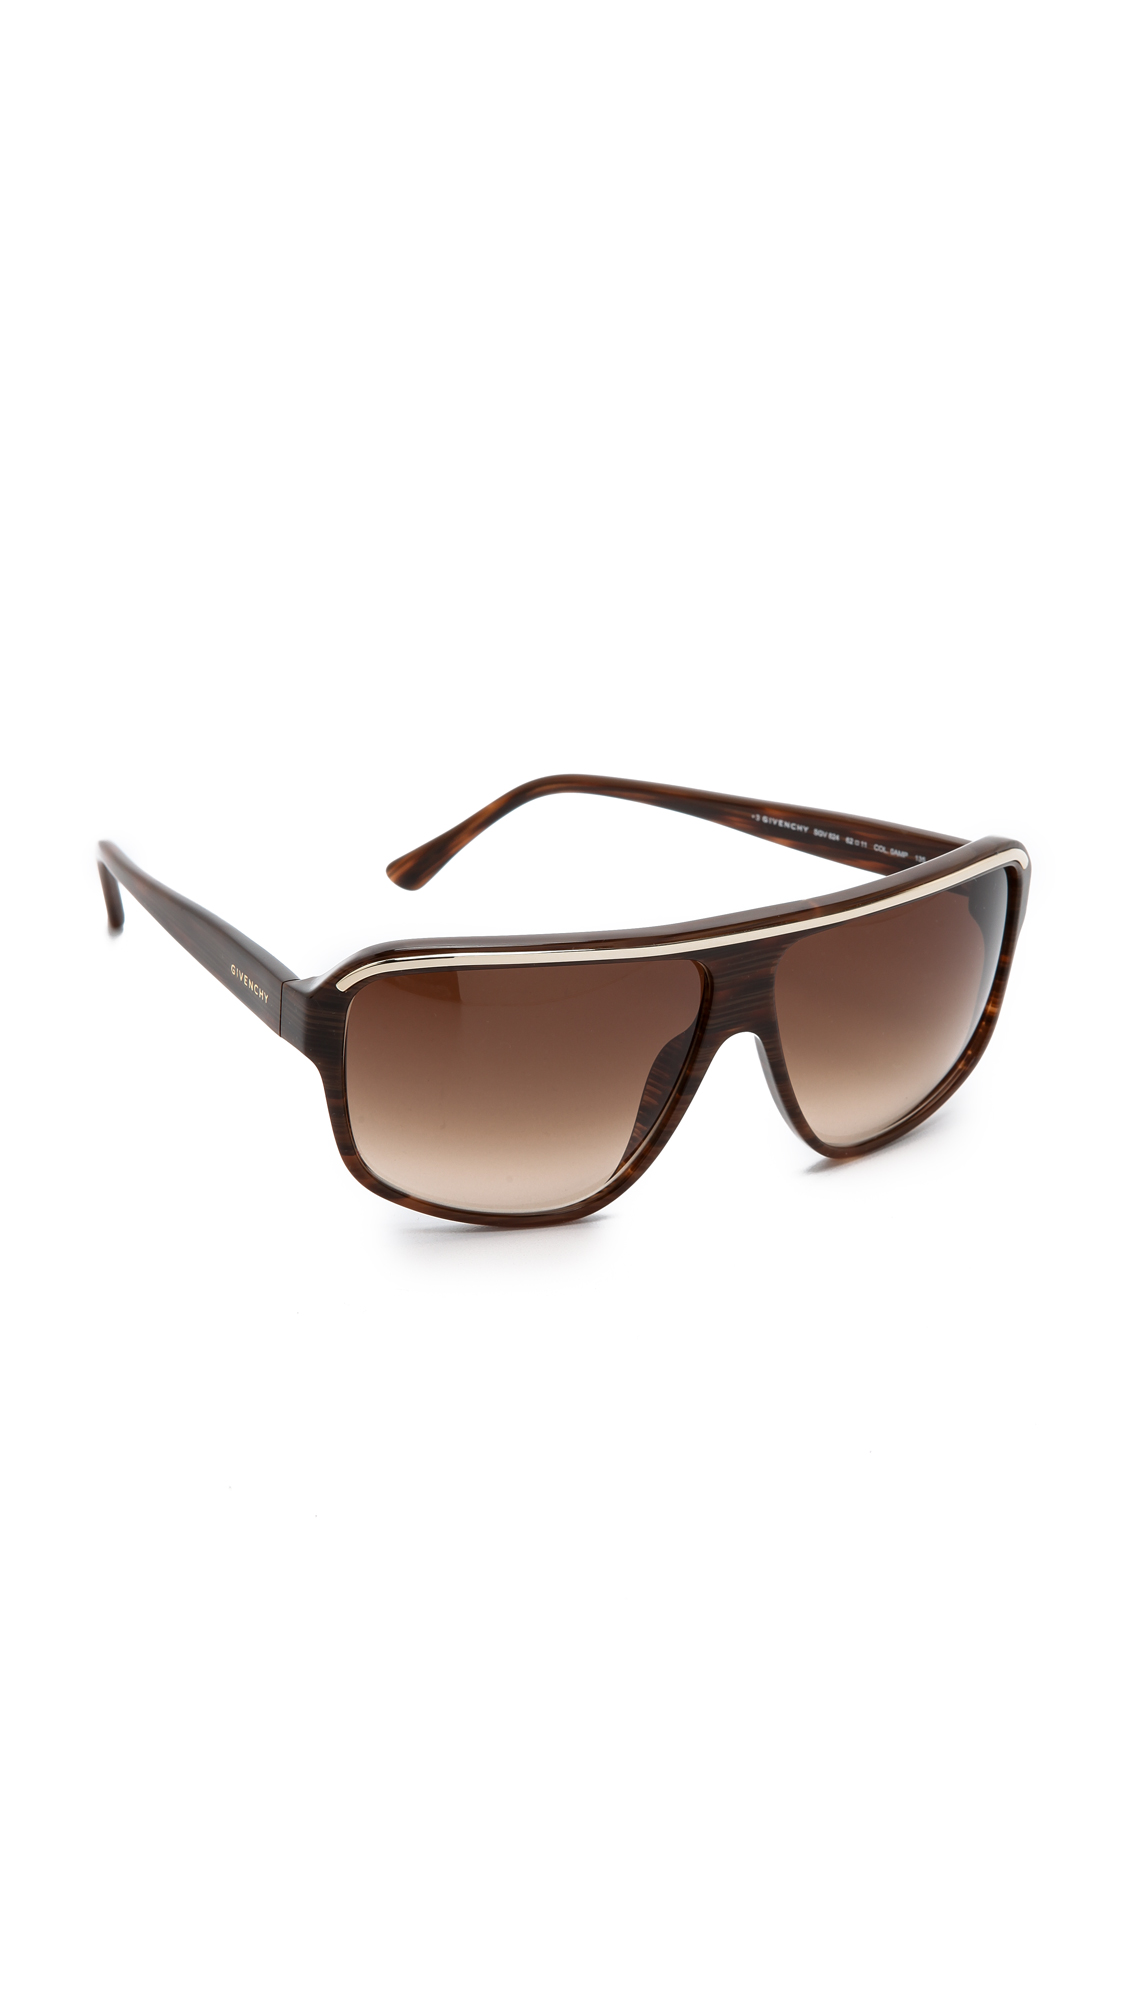 Best Lightweight Glasses Frames : Givenchy Metal Flat Top Sunglasses - Light Brown/Brown ...